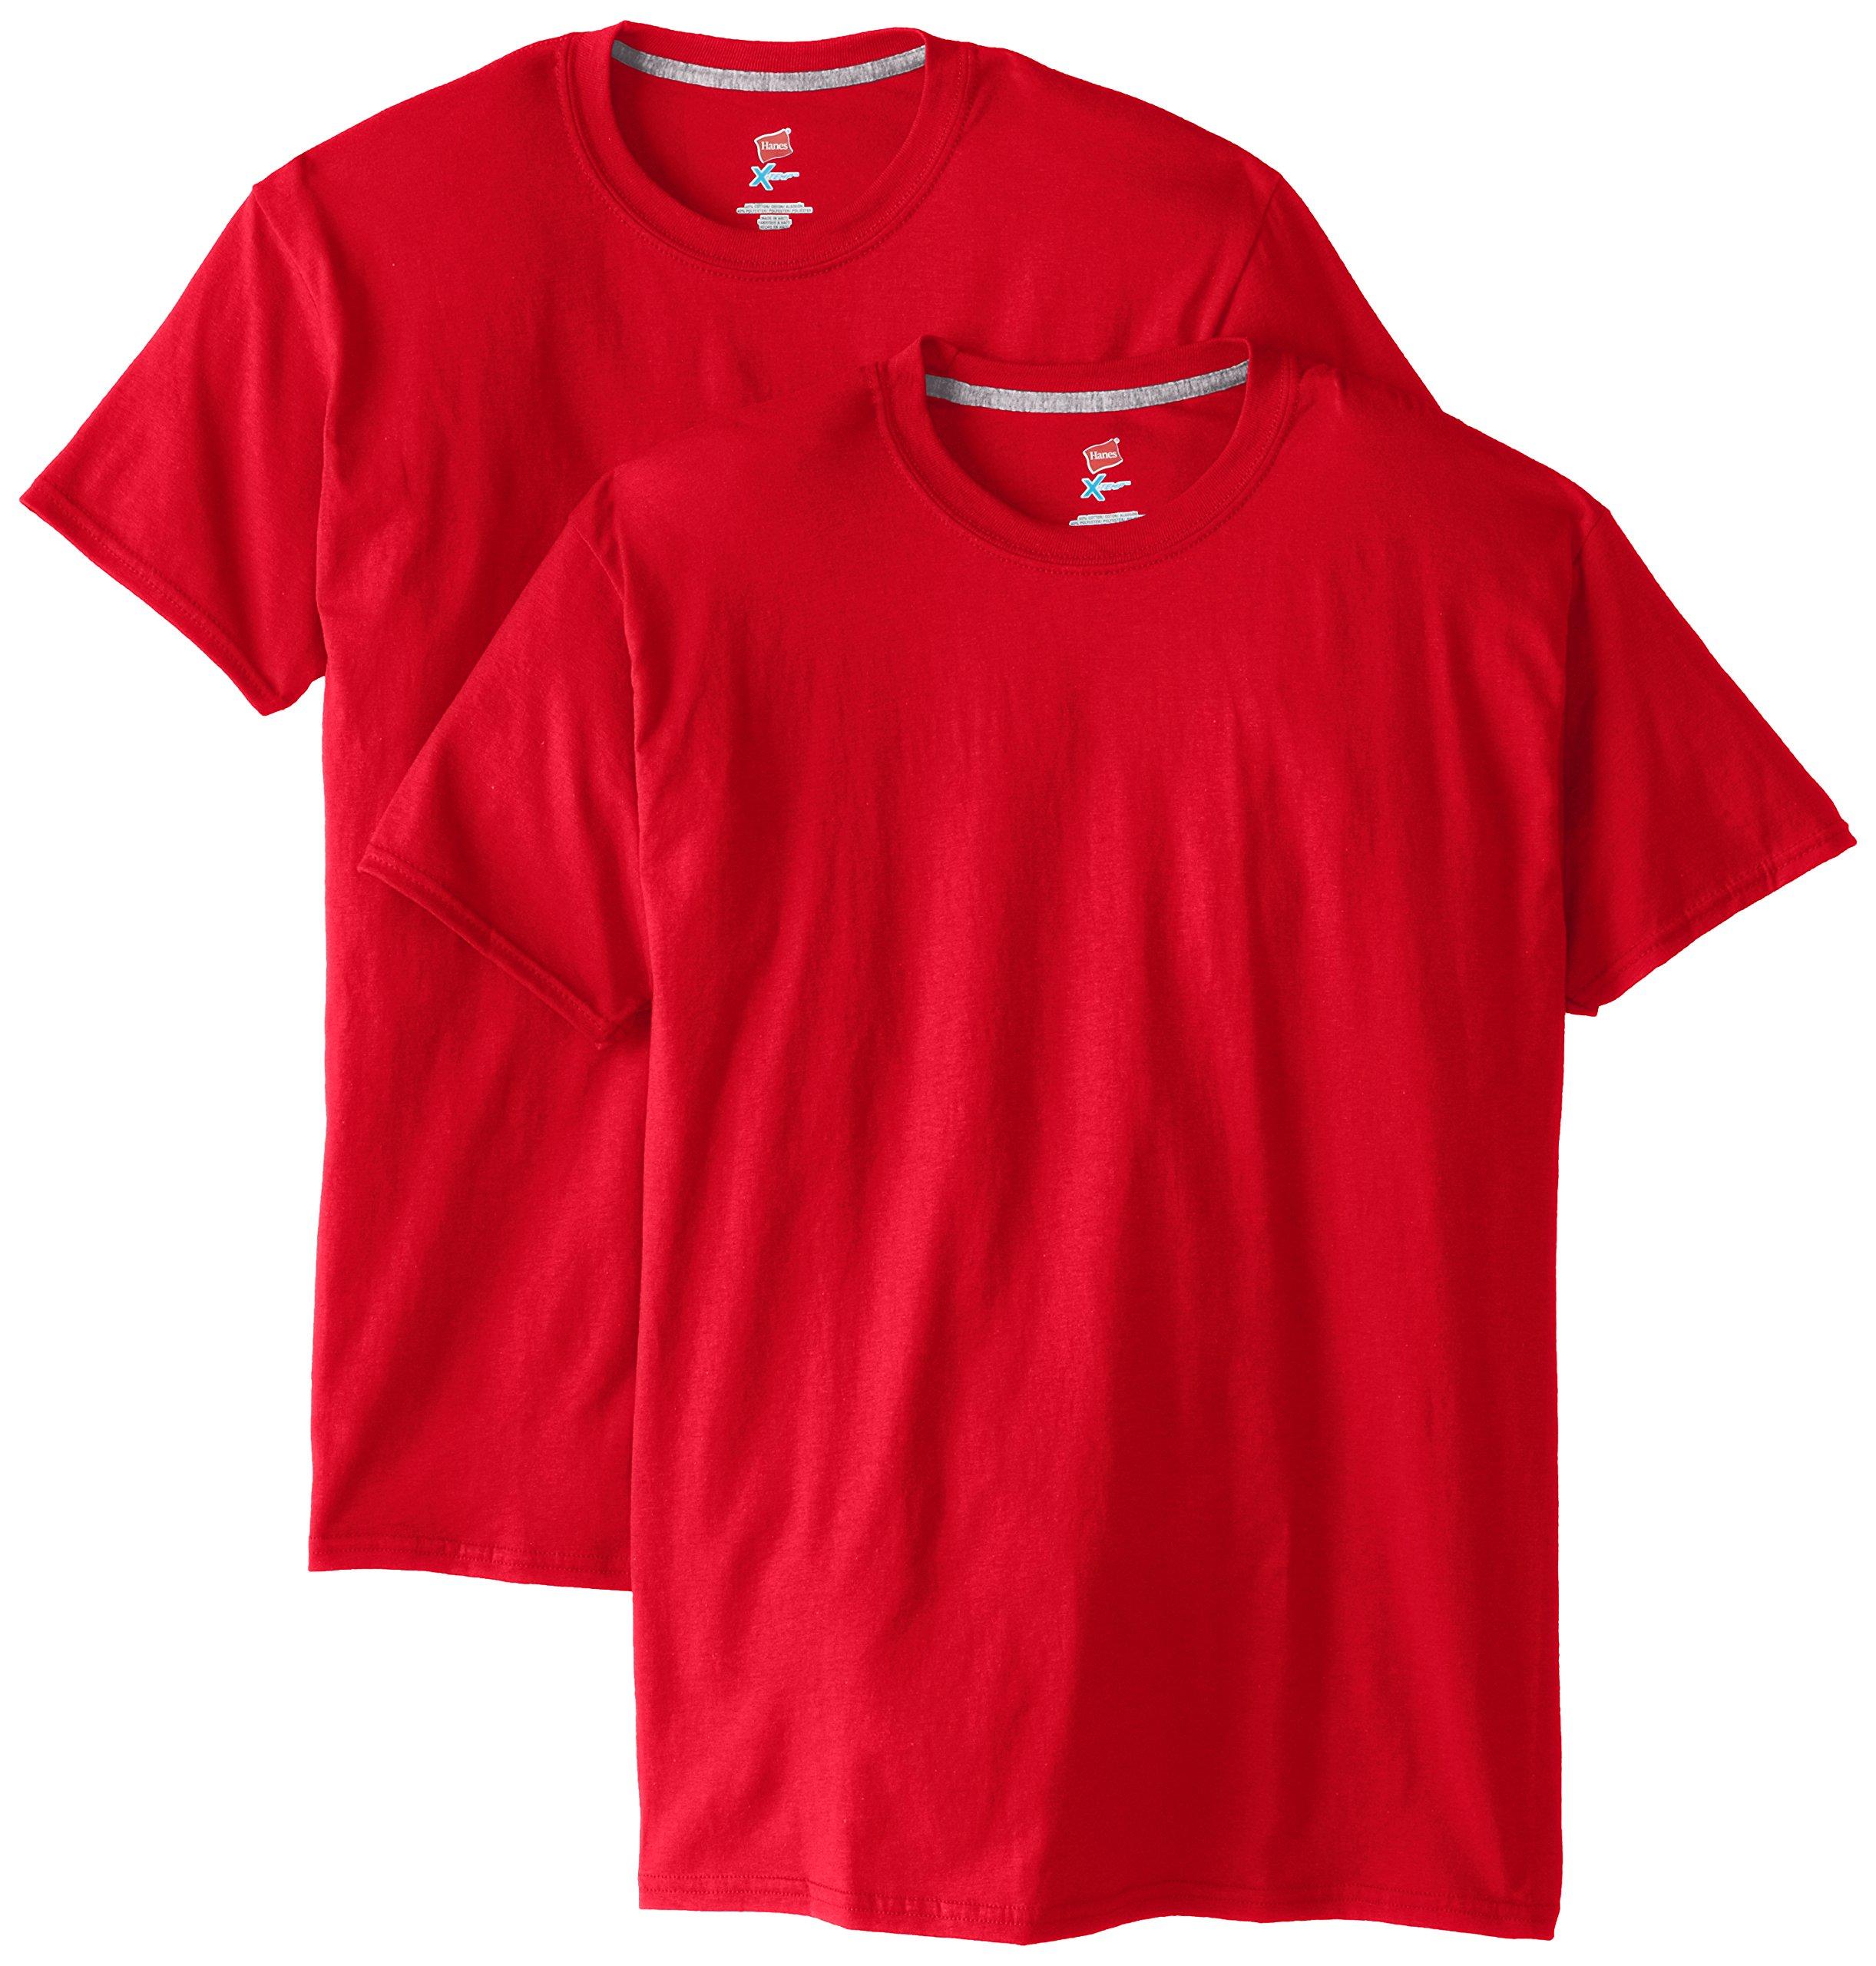 Hanes Men's 2 Pack X-Temp Performance T-Shirt, Deep Red, 3X-Large